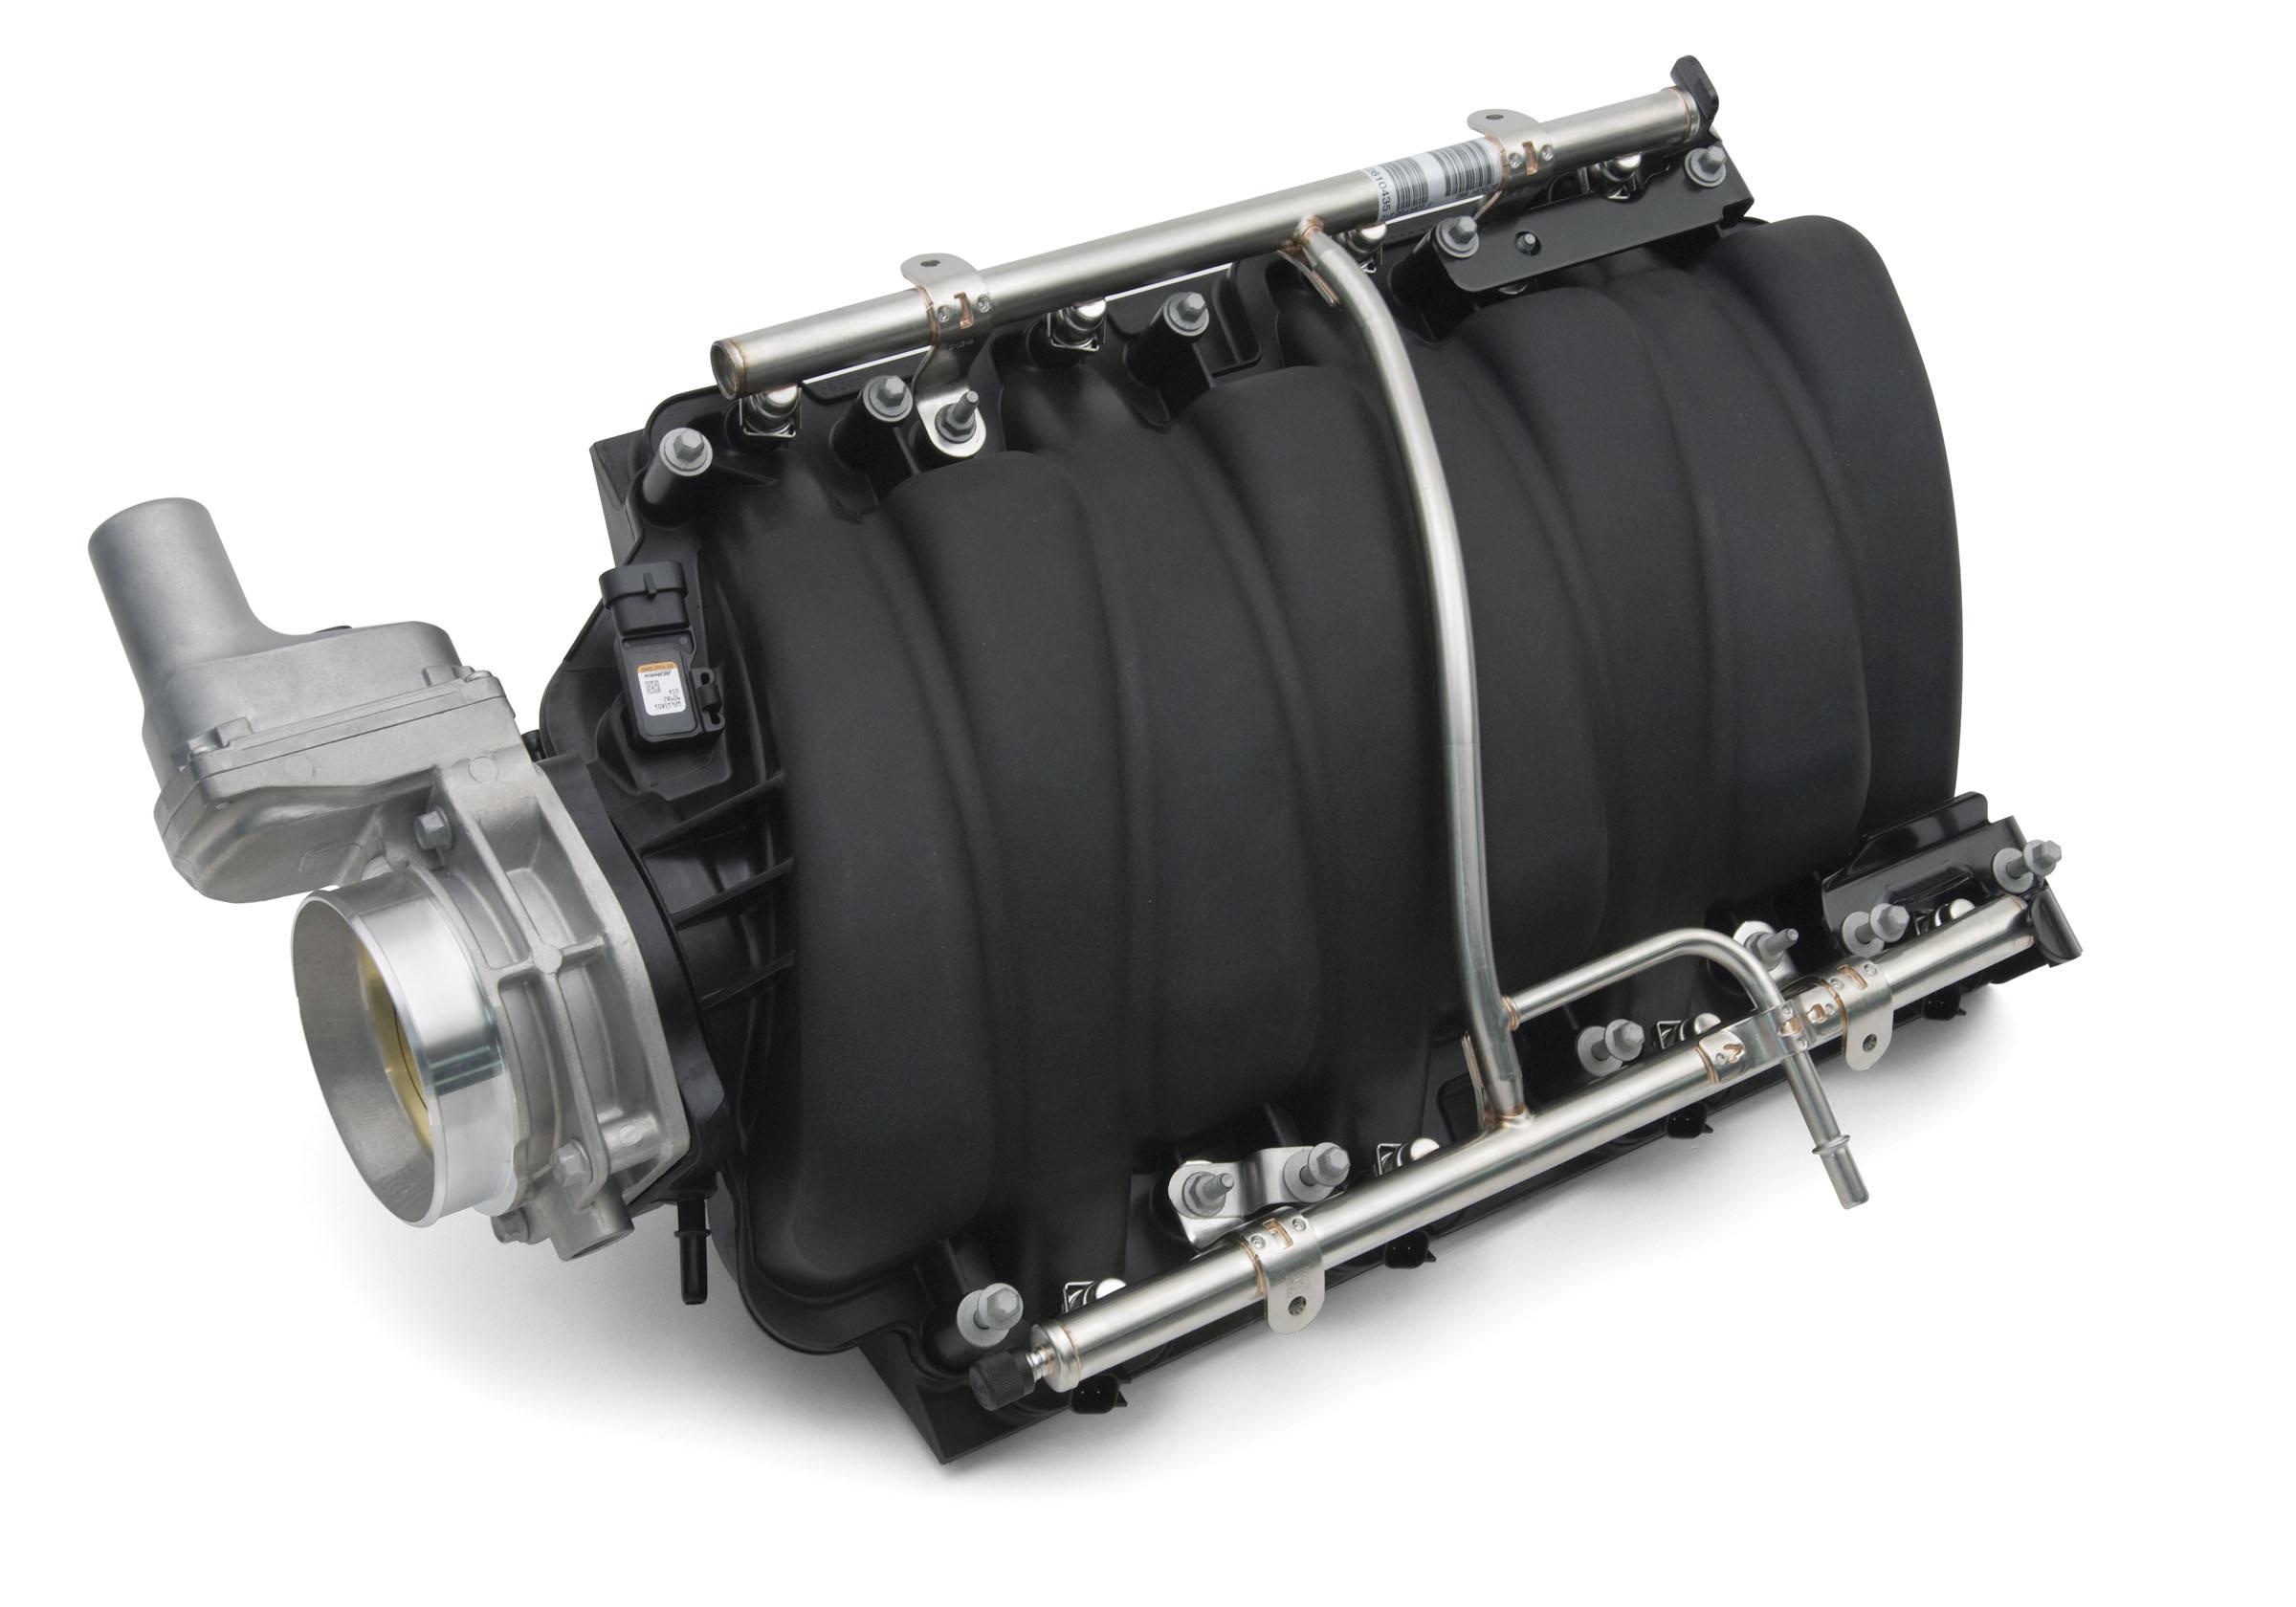 Gmpp Announces Lsx454 Crate Engine Intake Kit Ls7 Wiring Harness